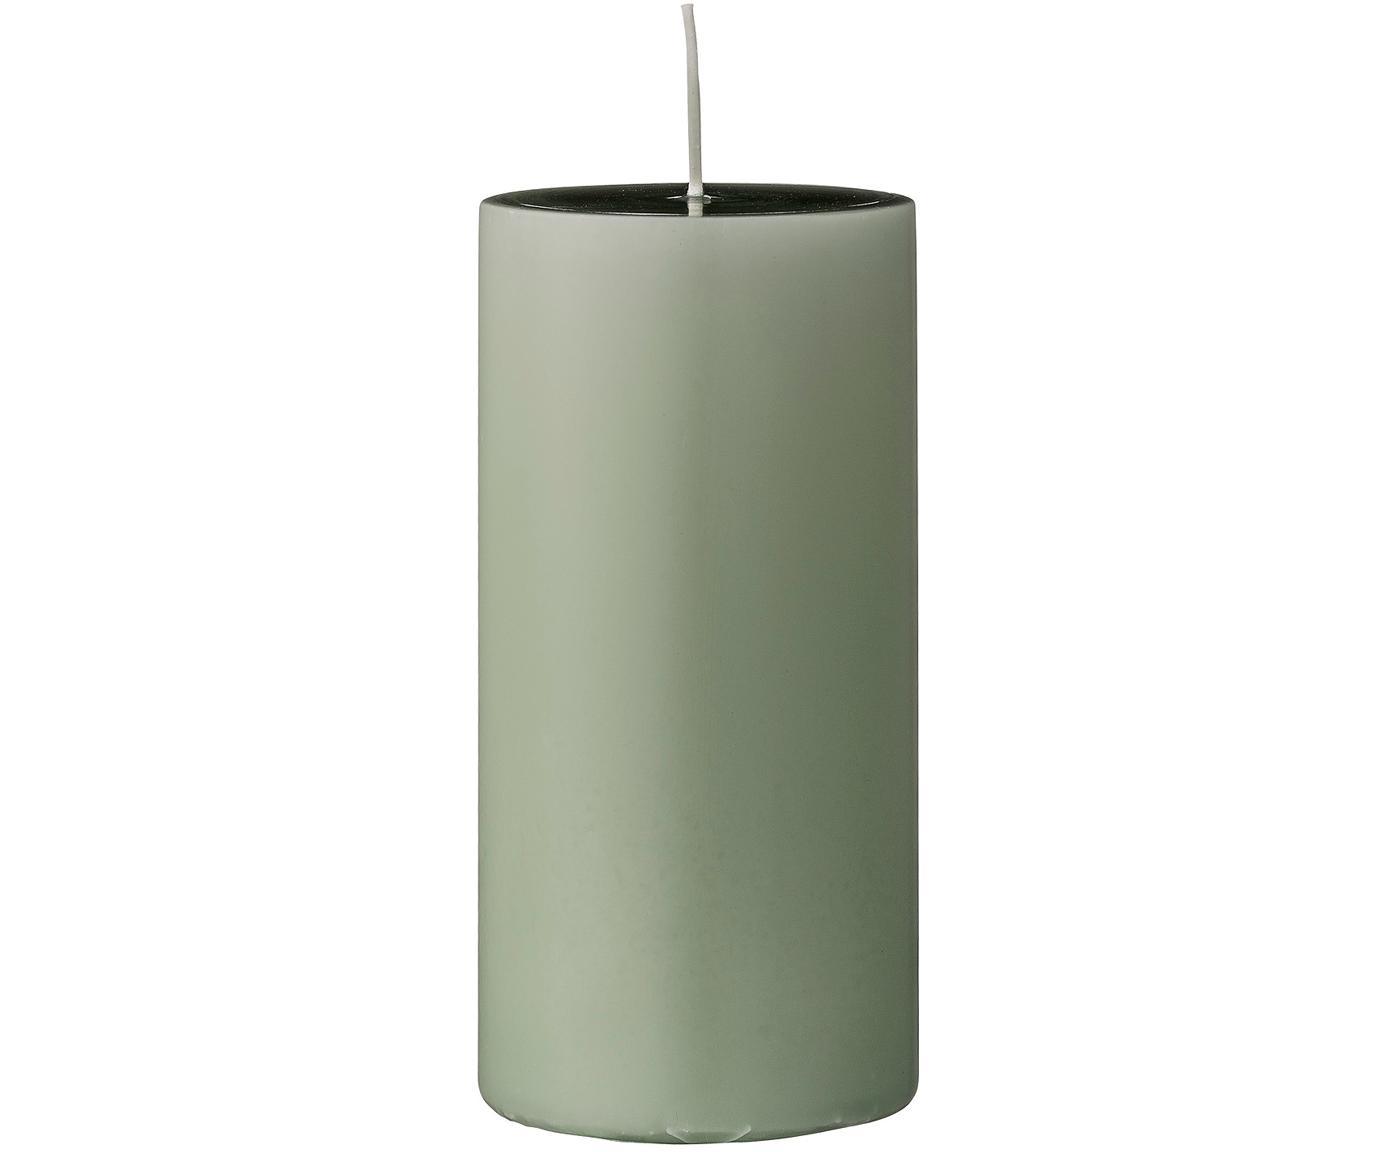 Candela pilastro Lulu 2 pz, Cera, Verde chiaro, Ø 7 x Alt. 15 cm